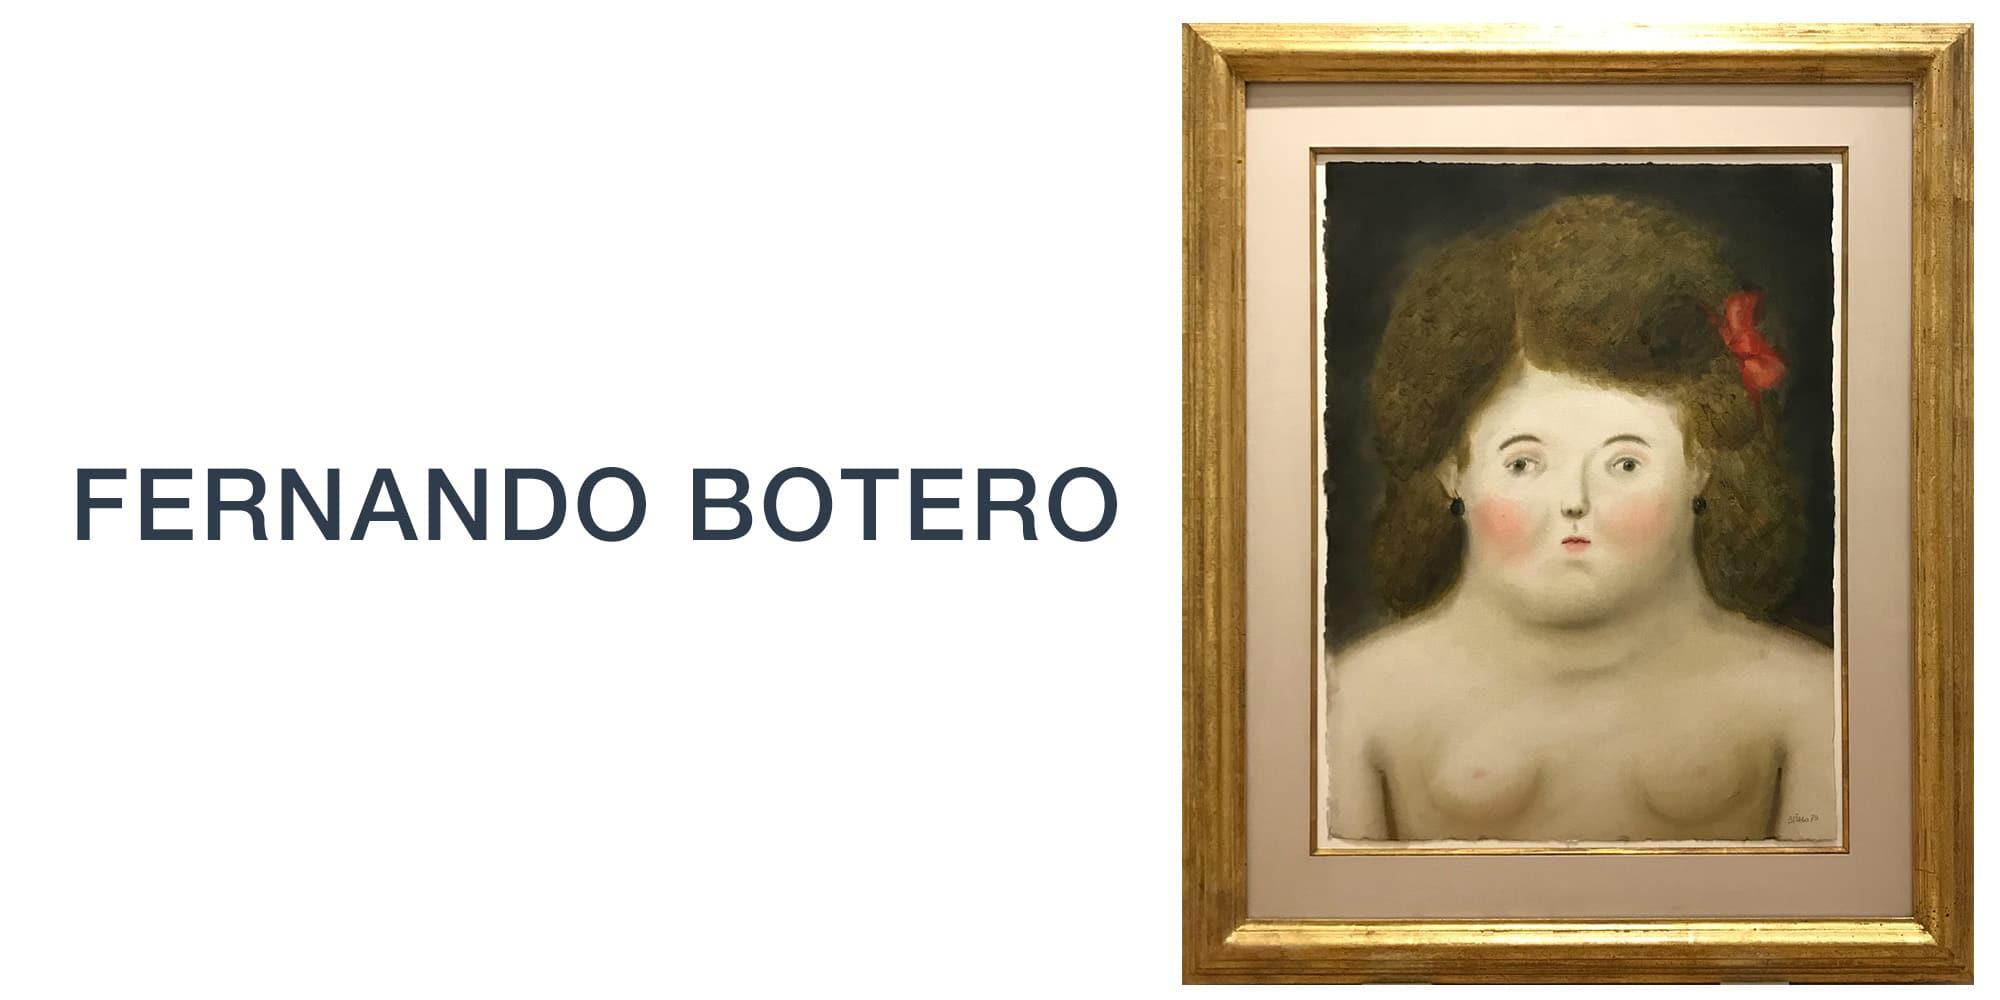 Fernando Botero Slide for Art Miami with Portrait